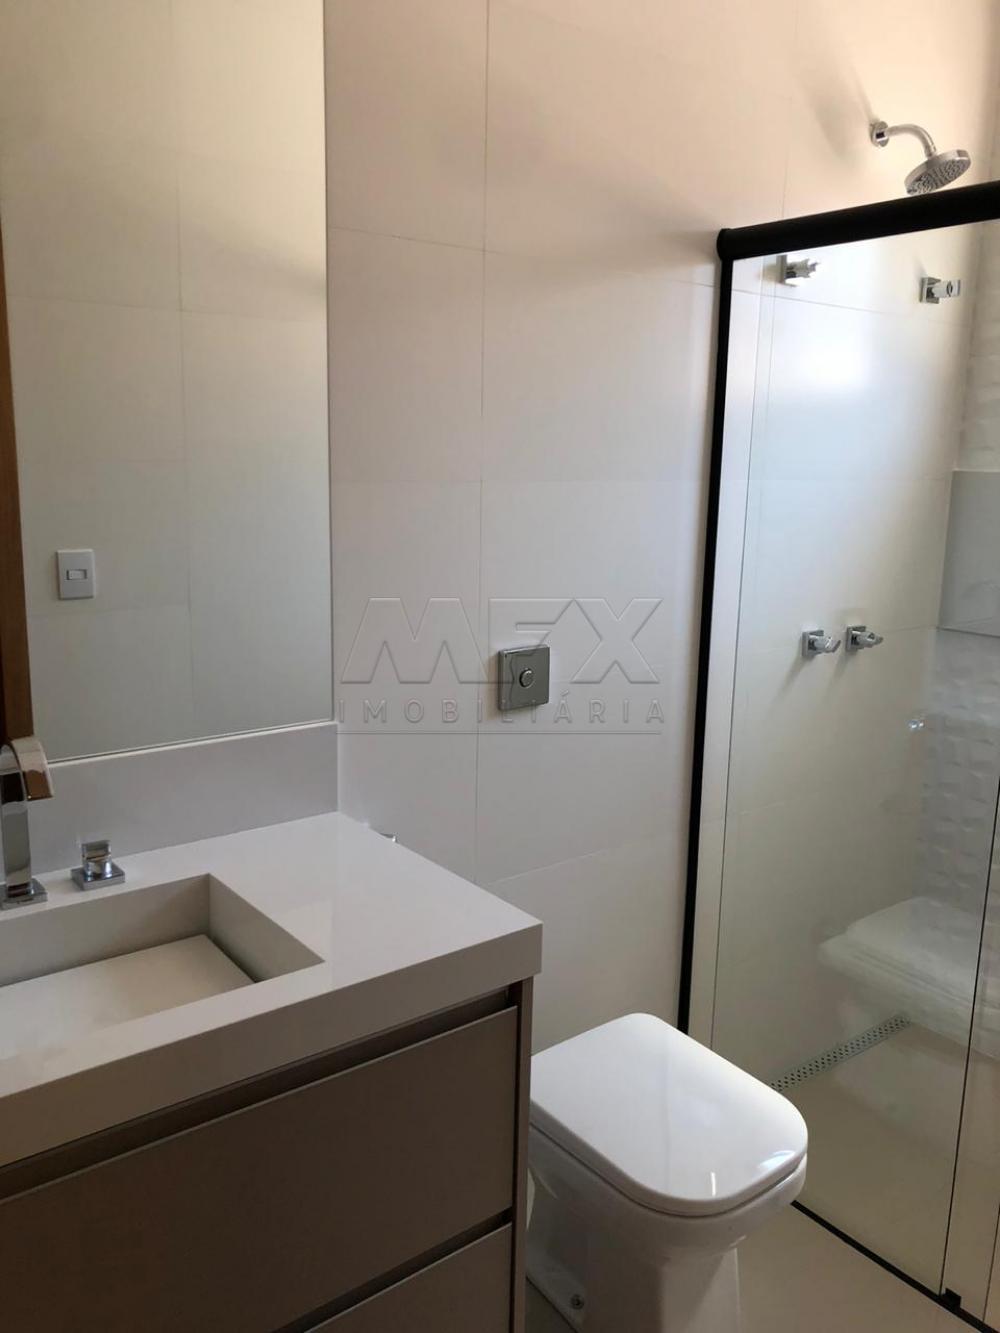 Comprar Casa / Condomínio em Bauru apenas R$ 1.600.000,00 - Foto 11